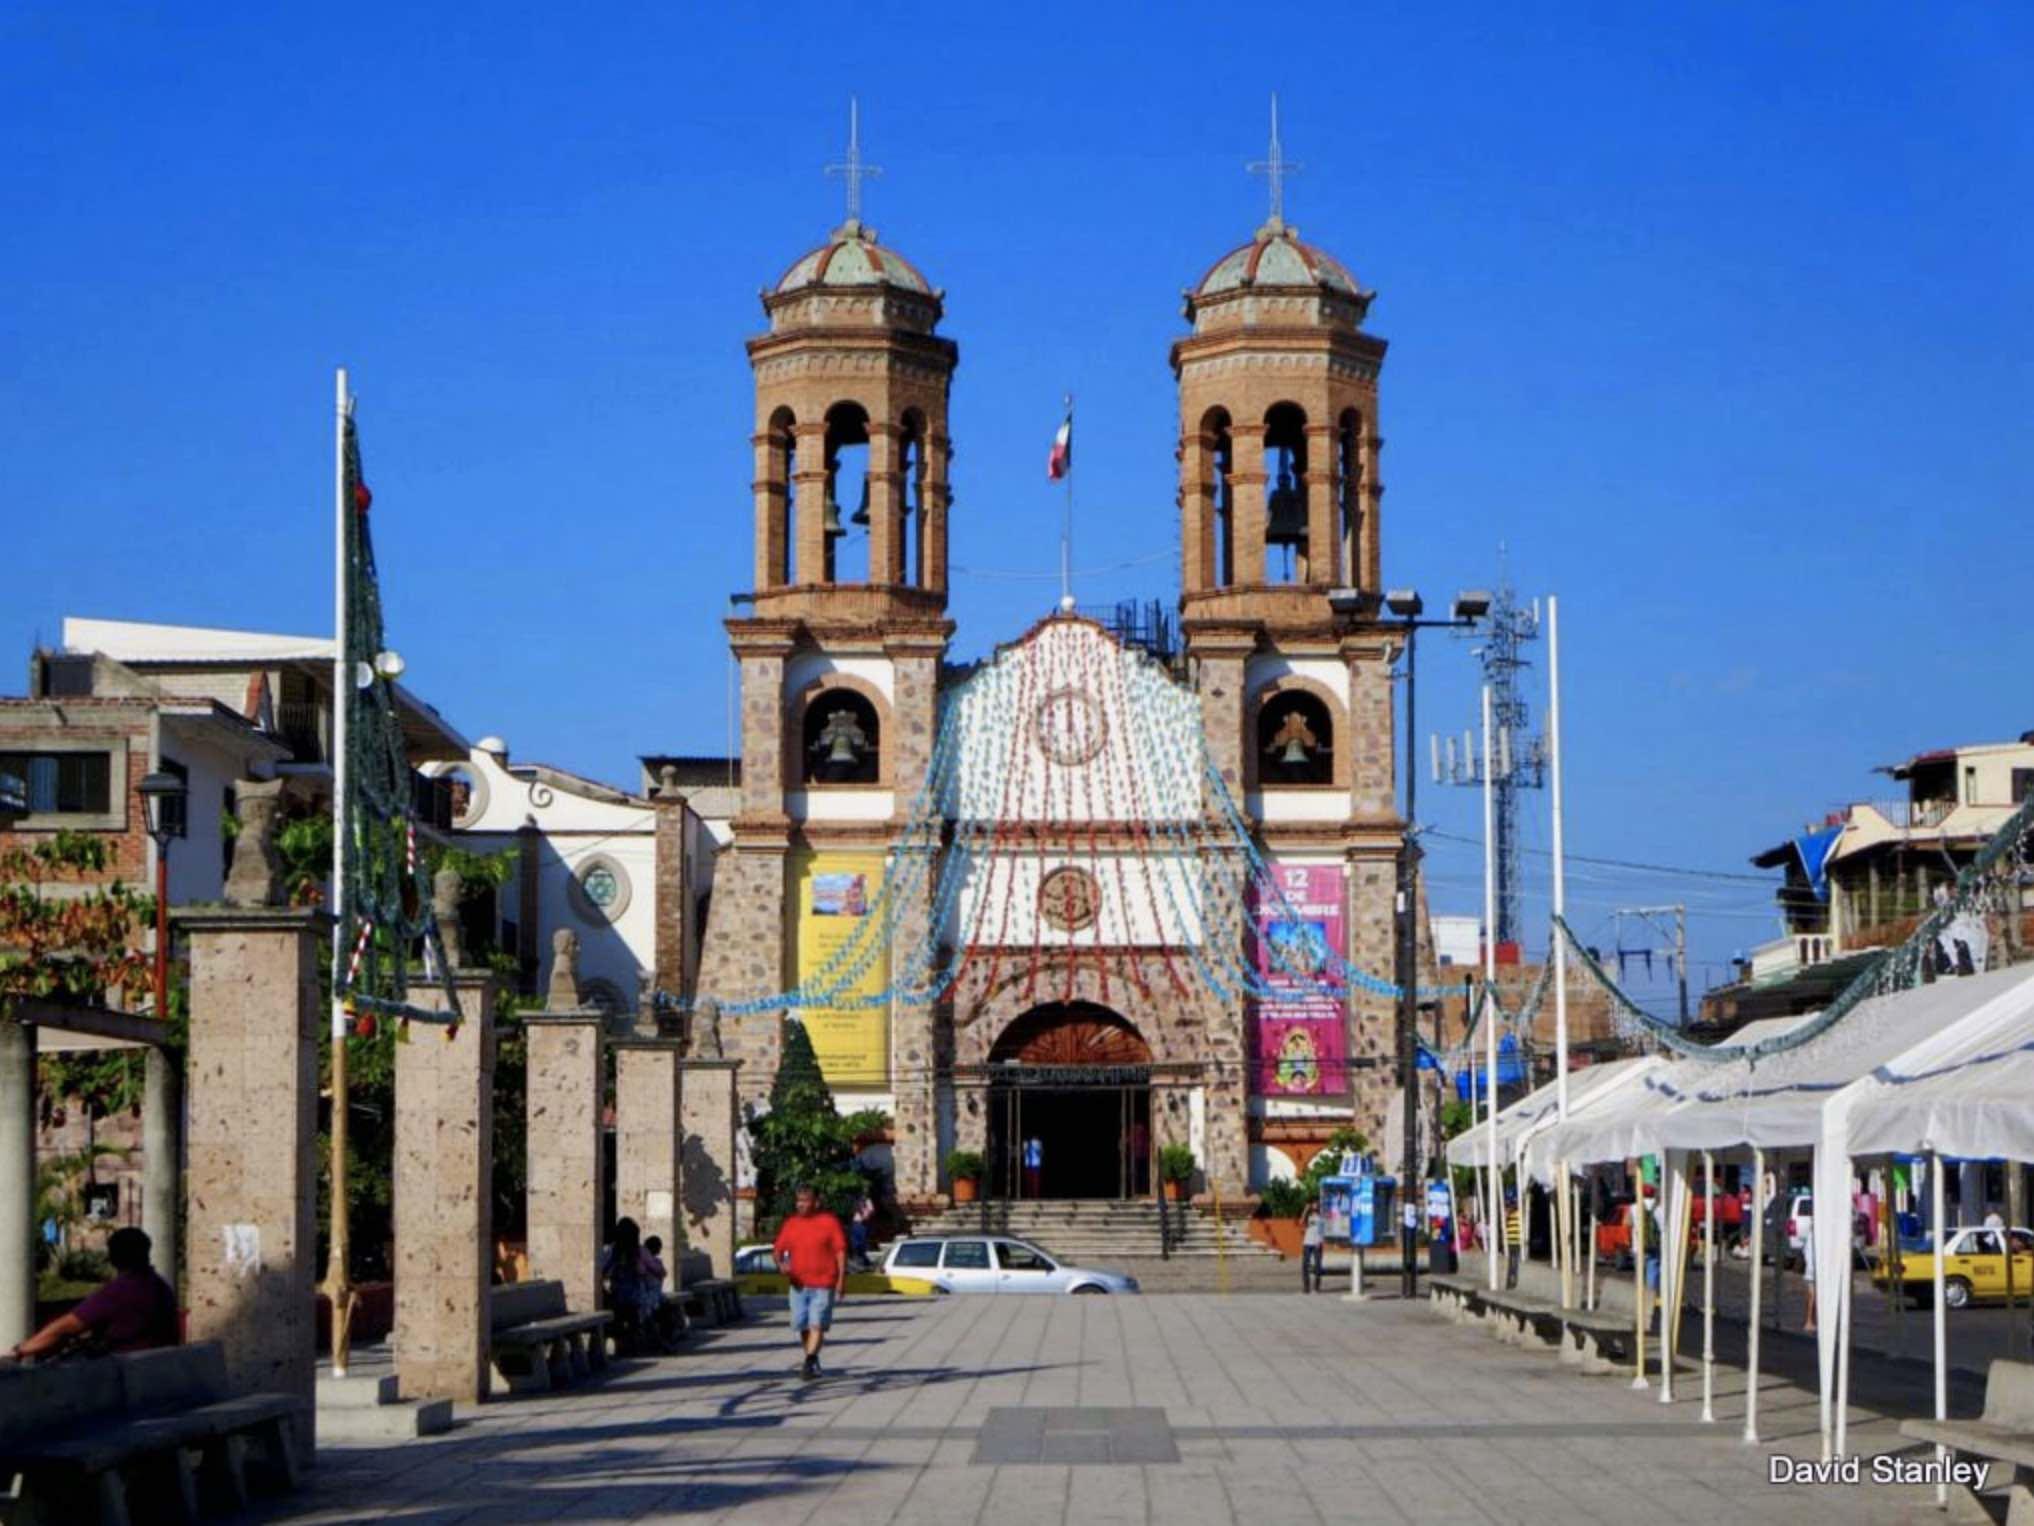 El Pitiallal Church